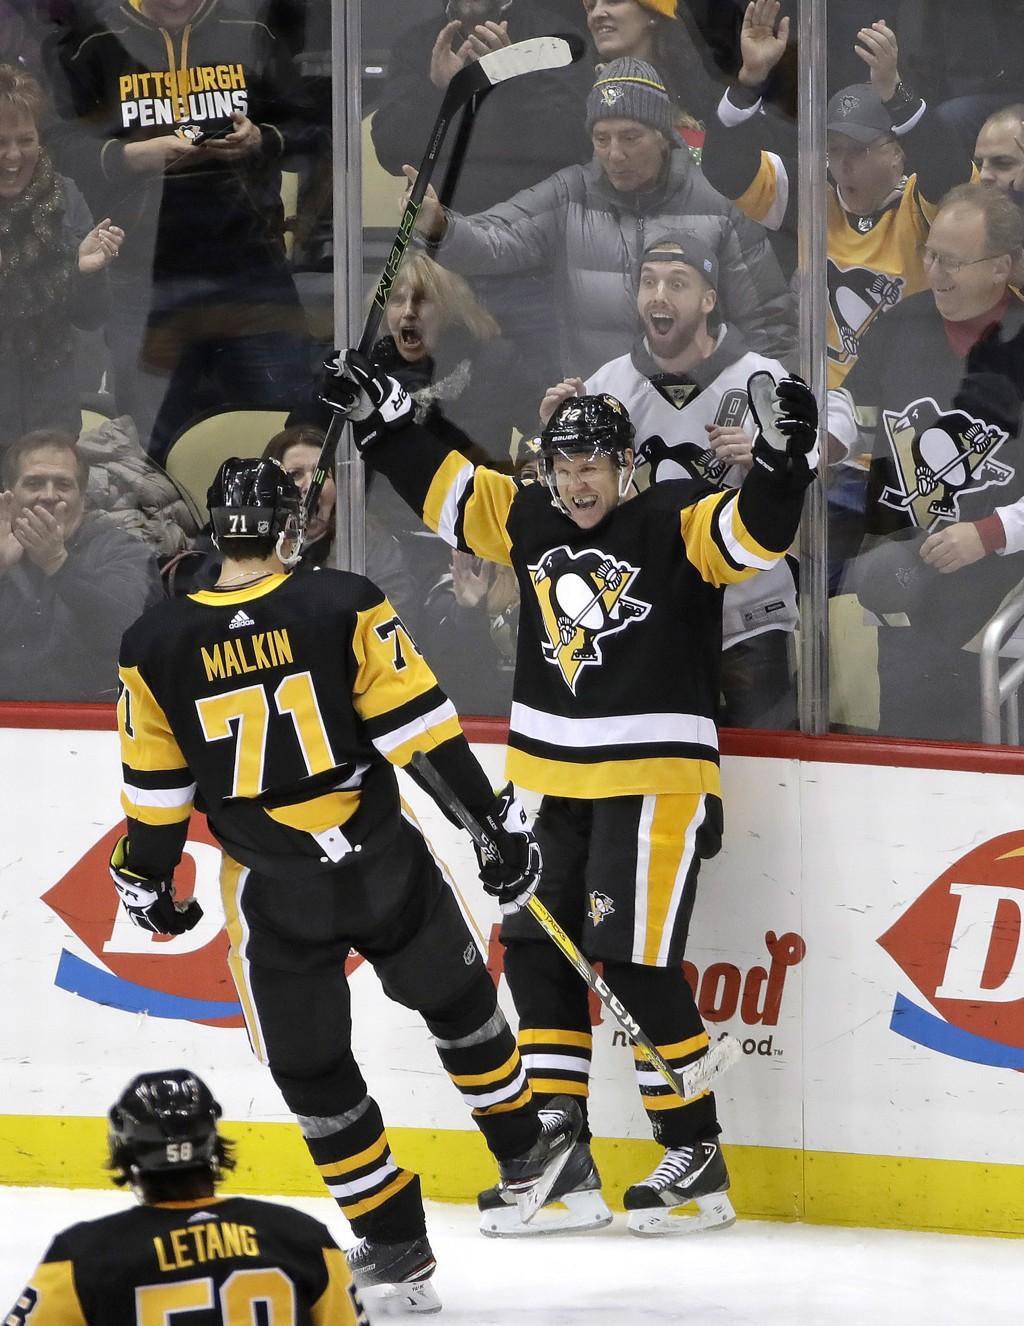 Pittsburgh Penguins Patric Hörnqvist (72) julbler sammen med Jevgenij Malkin (71) etter sitt rekordraske hattrick. Foto: Gene J. Puskar / AP / NTB scanpix